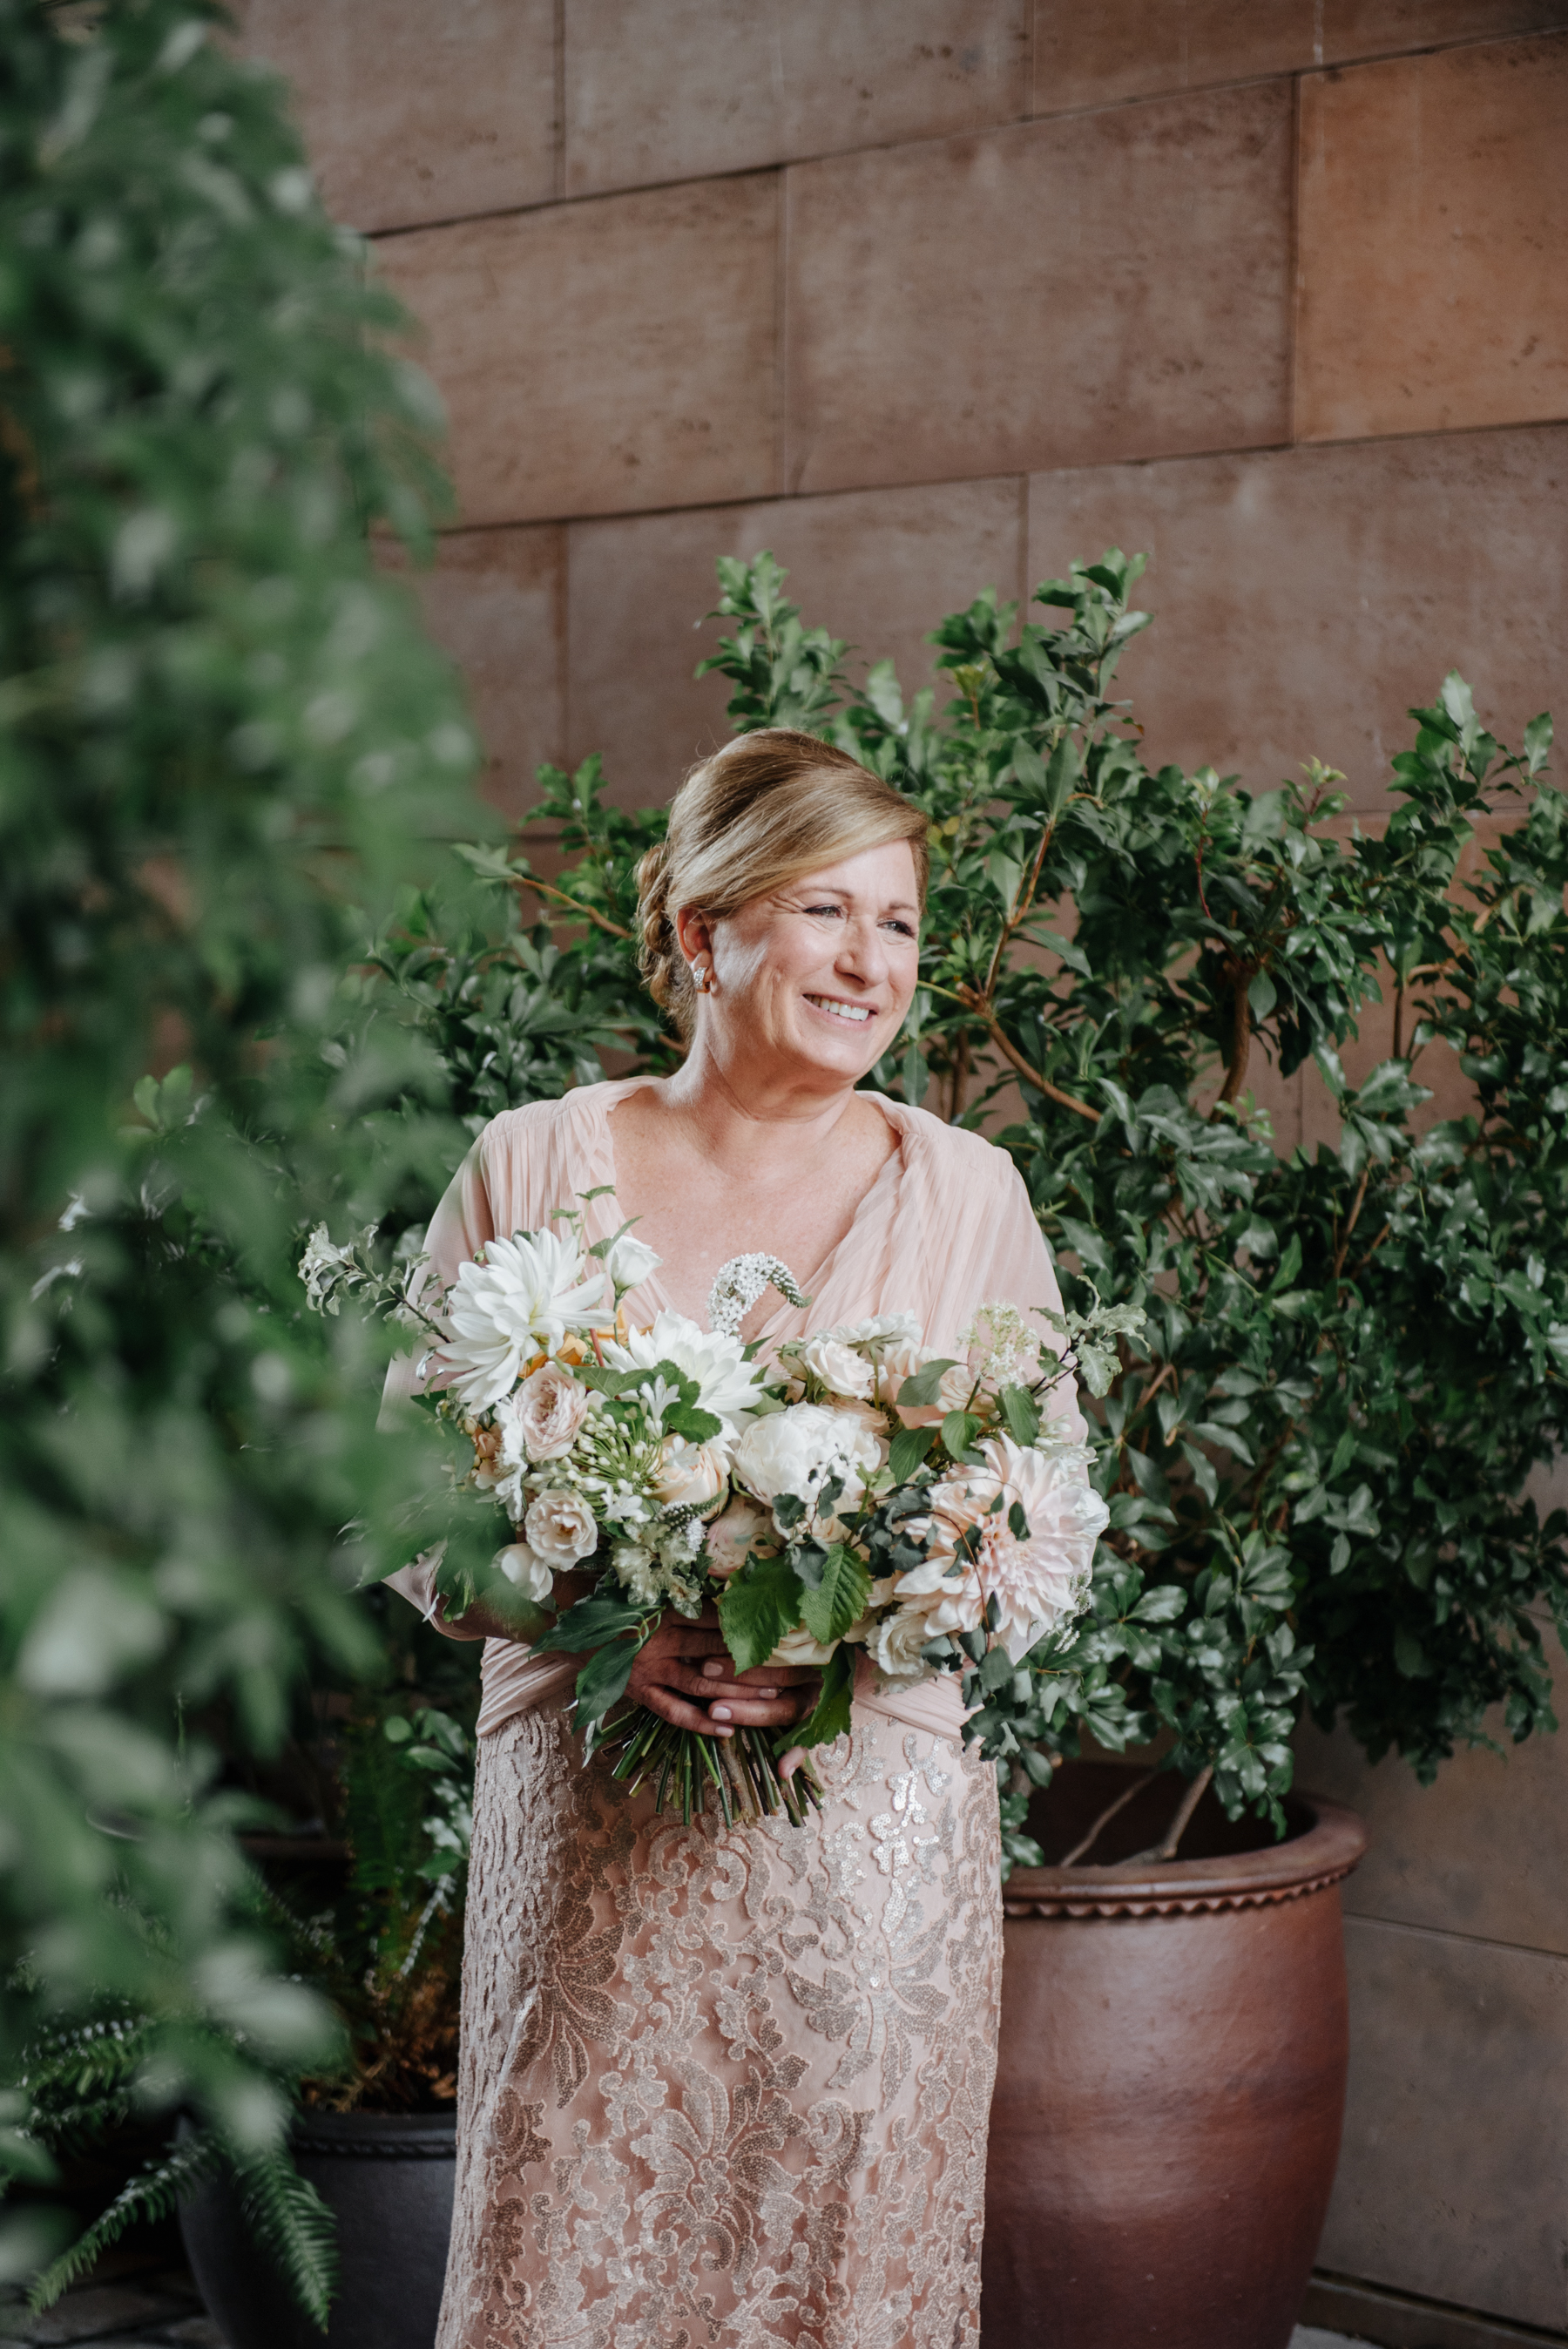 kaoverii_silva_photographer_cynthia_richard_wedding_vancouver_brix_&_mortar-12.jpg